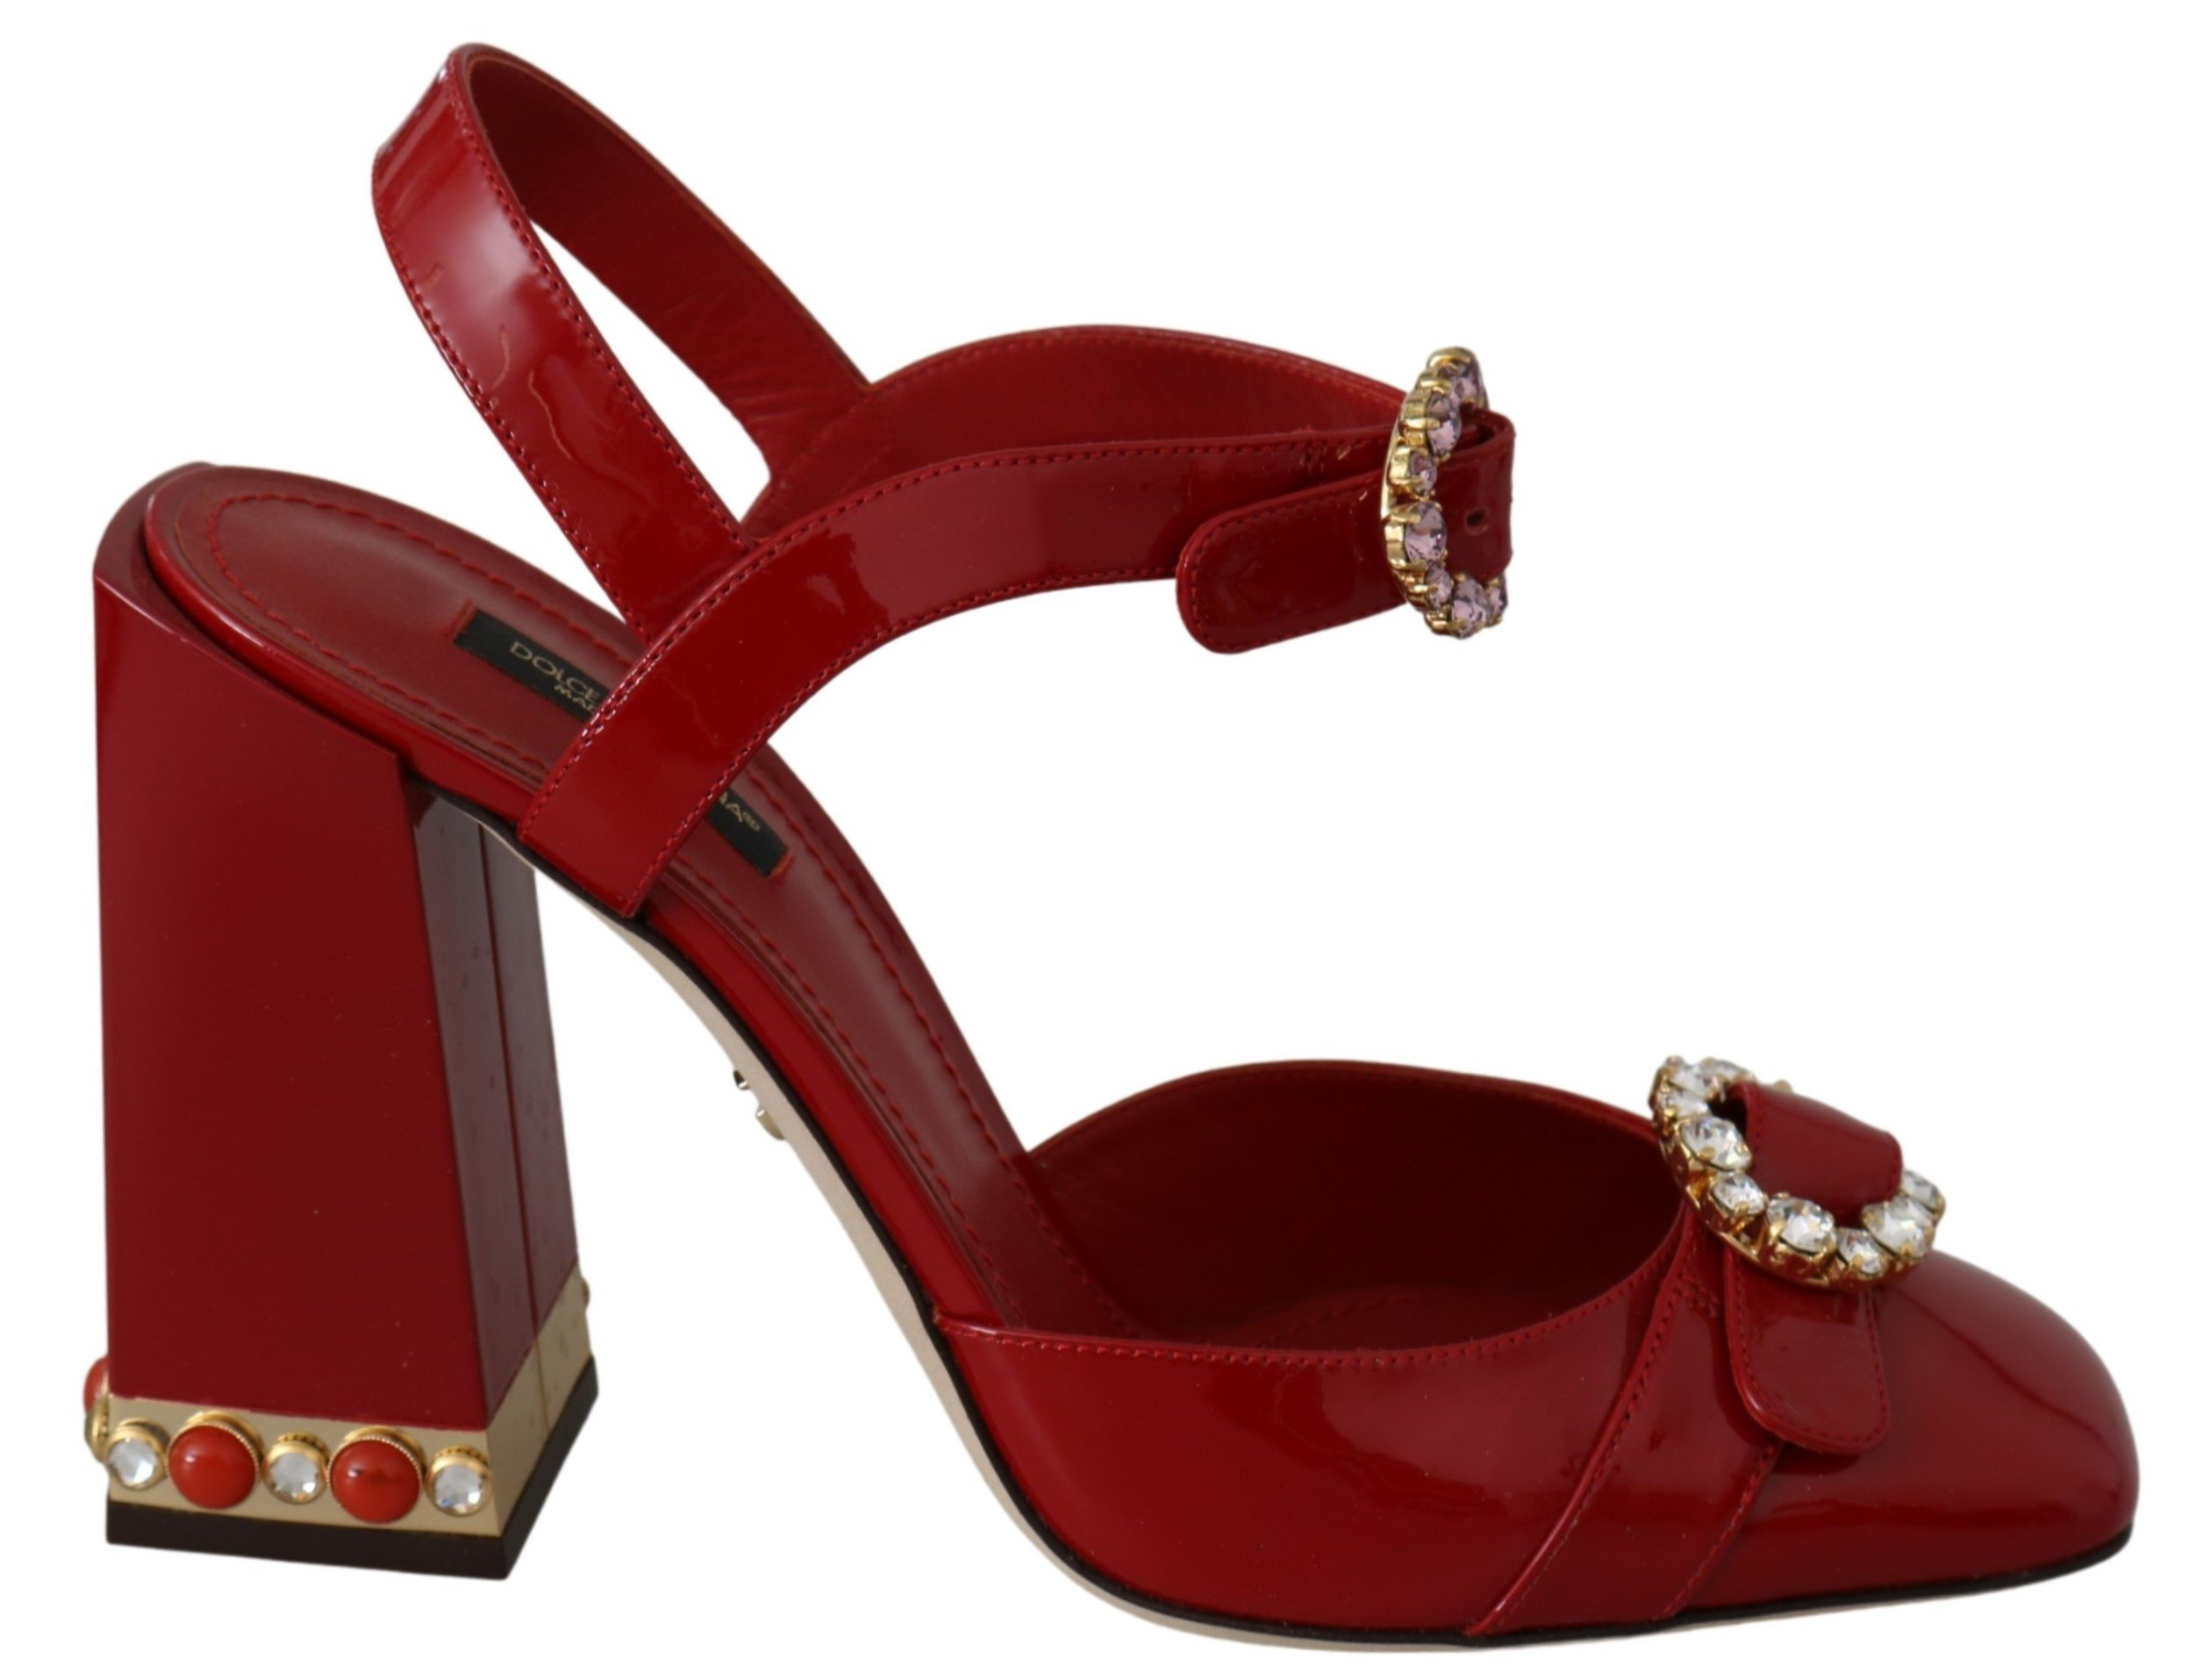 Dolce & Gabbana Women's Crystals Ankle Strap Sandal Red LA6654 - EU40/US9.5